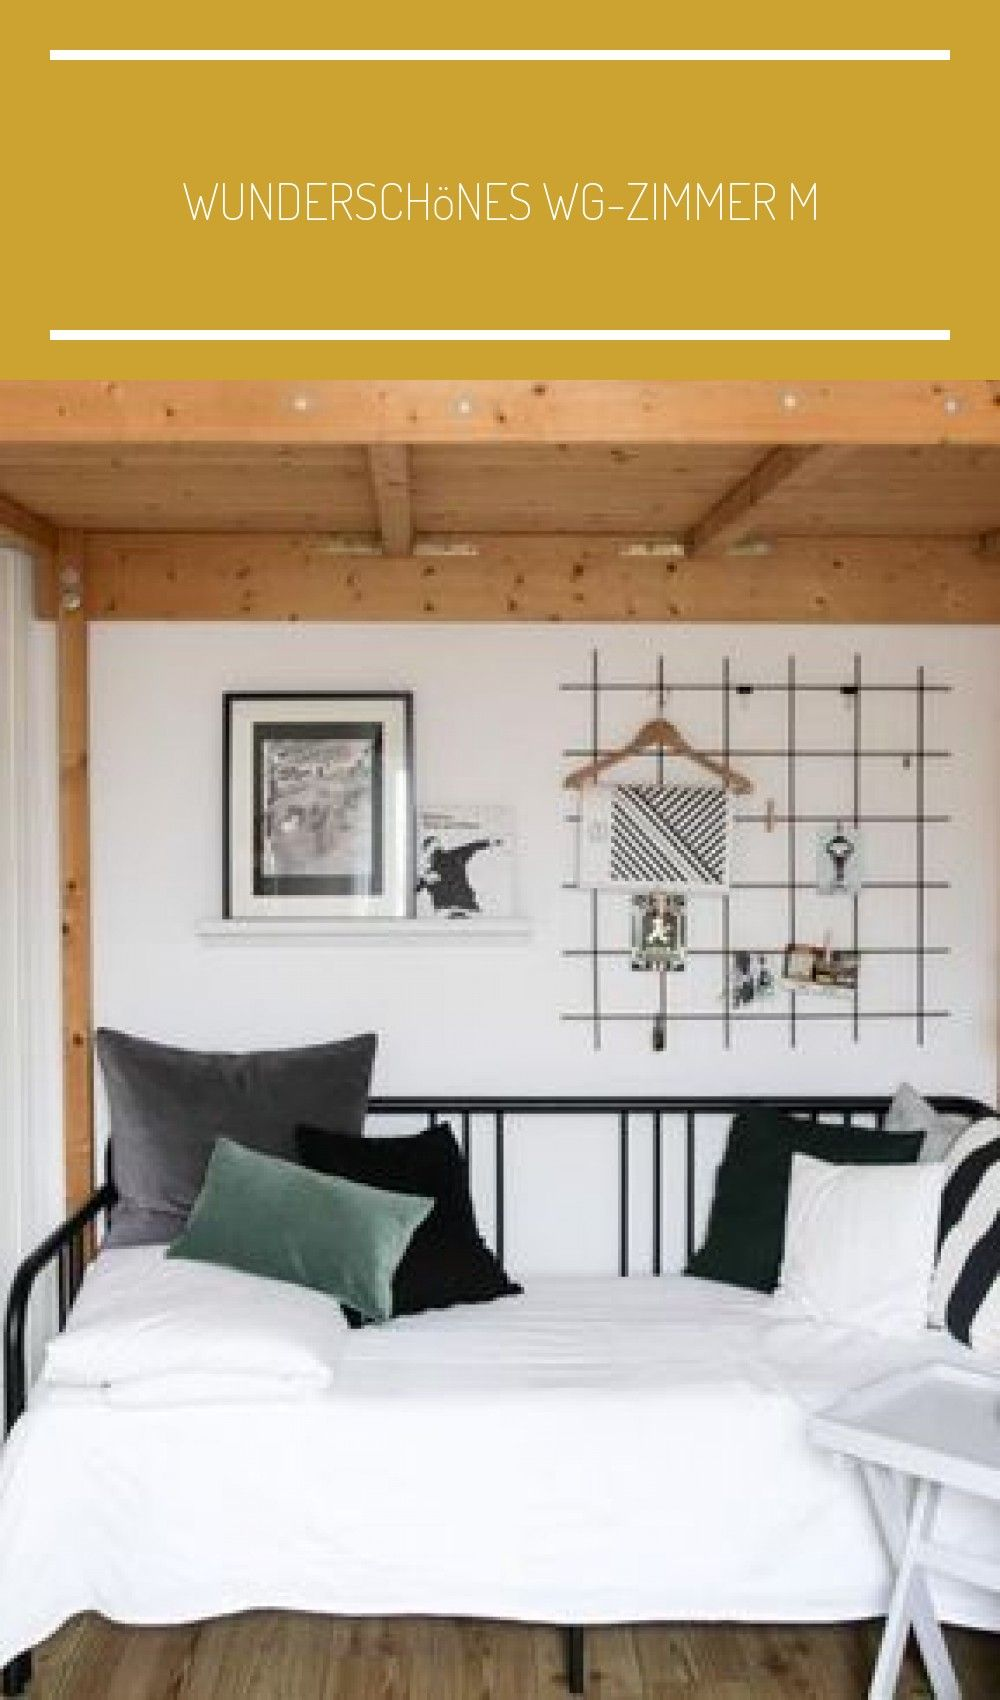 Wunderschones Wg Zimmer Mit Eingebautem Hochbett In Bielefelder